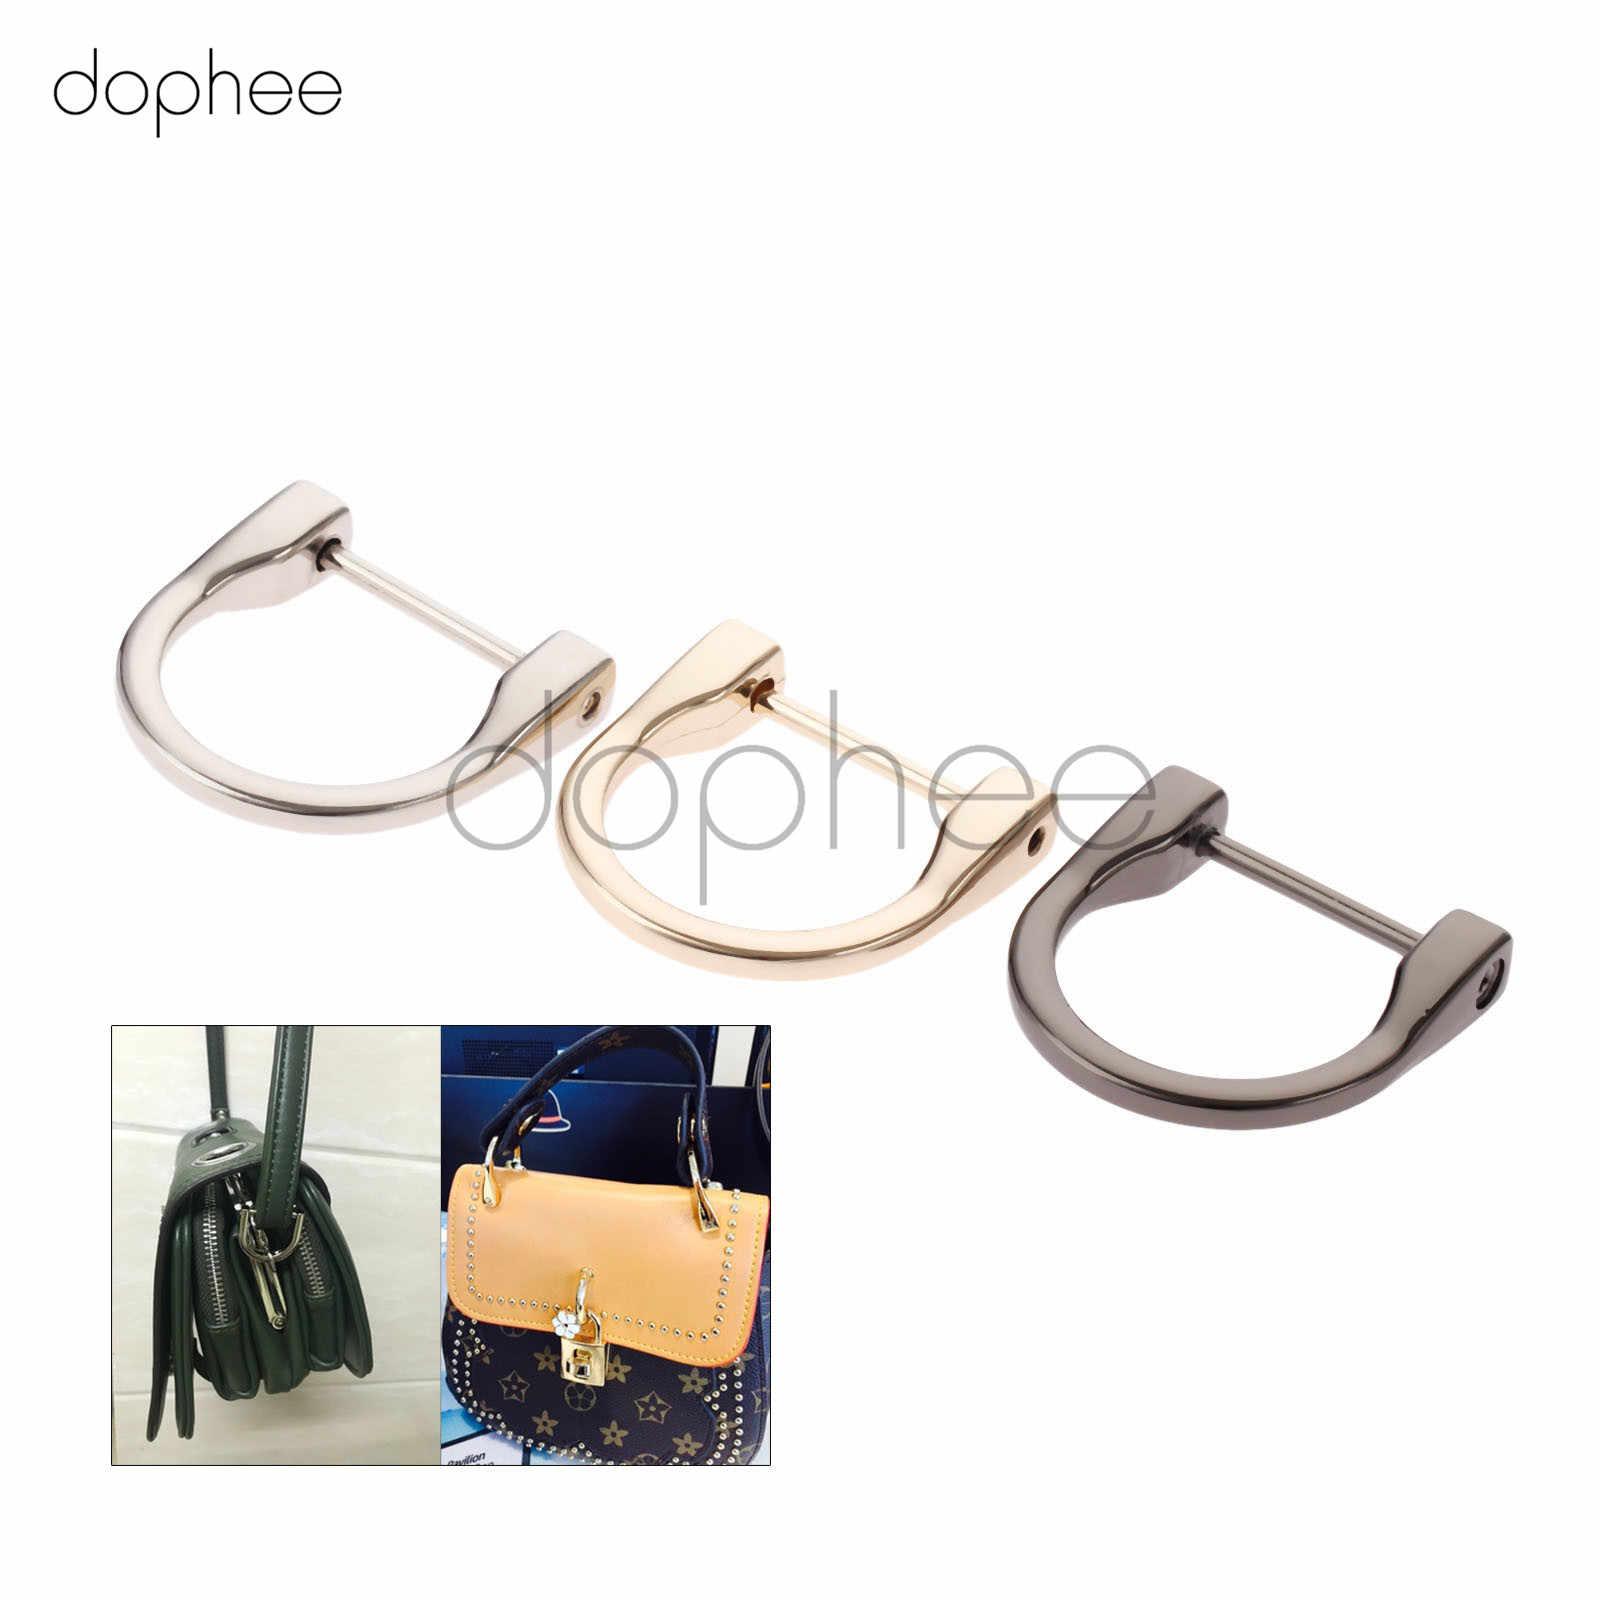 dophee 2pcs 38 38mm Metal D Ring Buckles Detachable Openable Handbag  Leather Shoulder Hand Bag 48a30d4dd7fd5